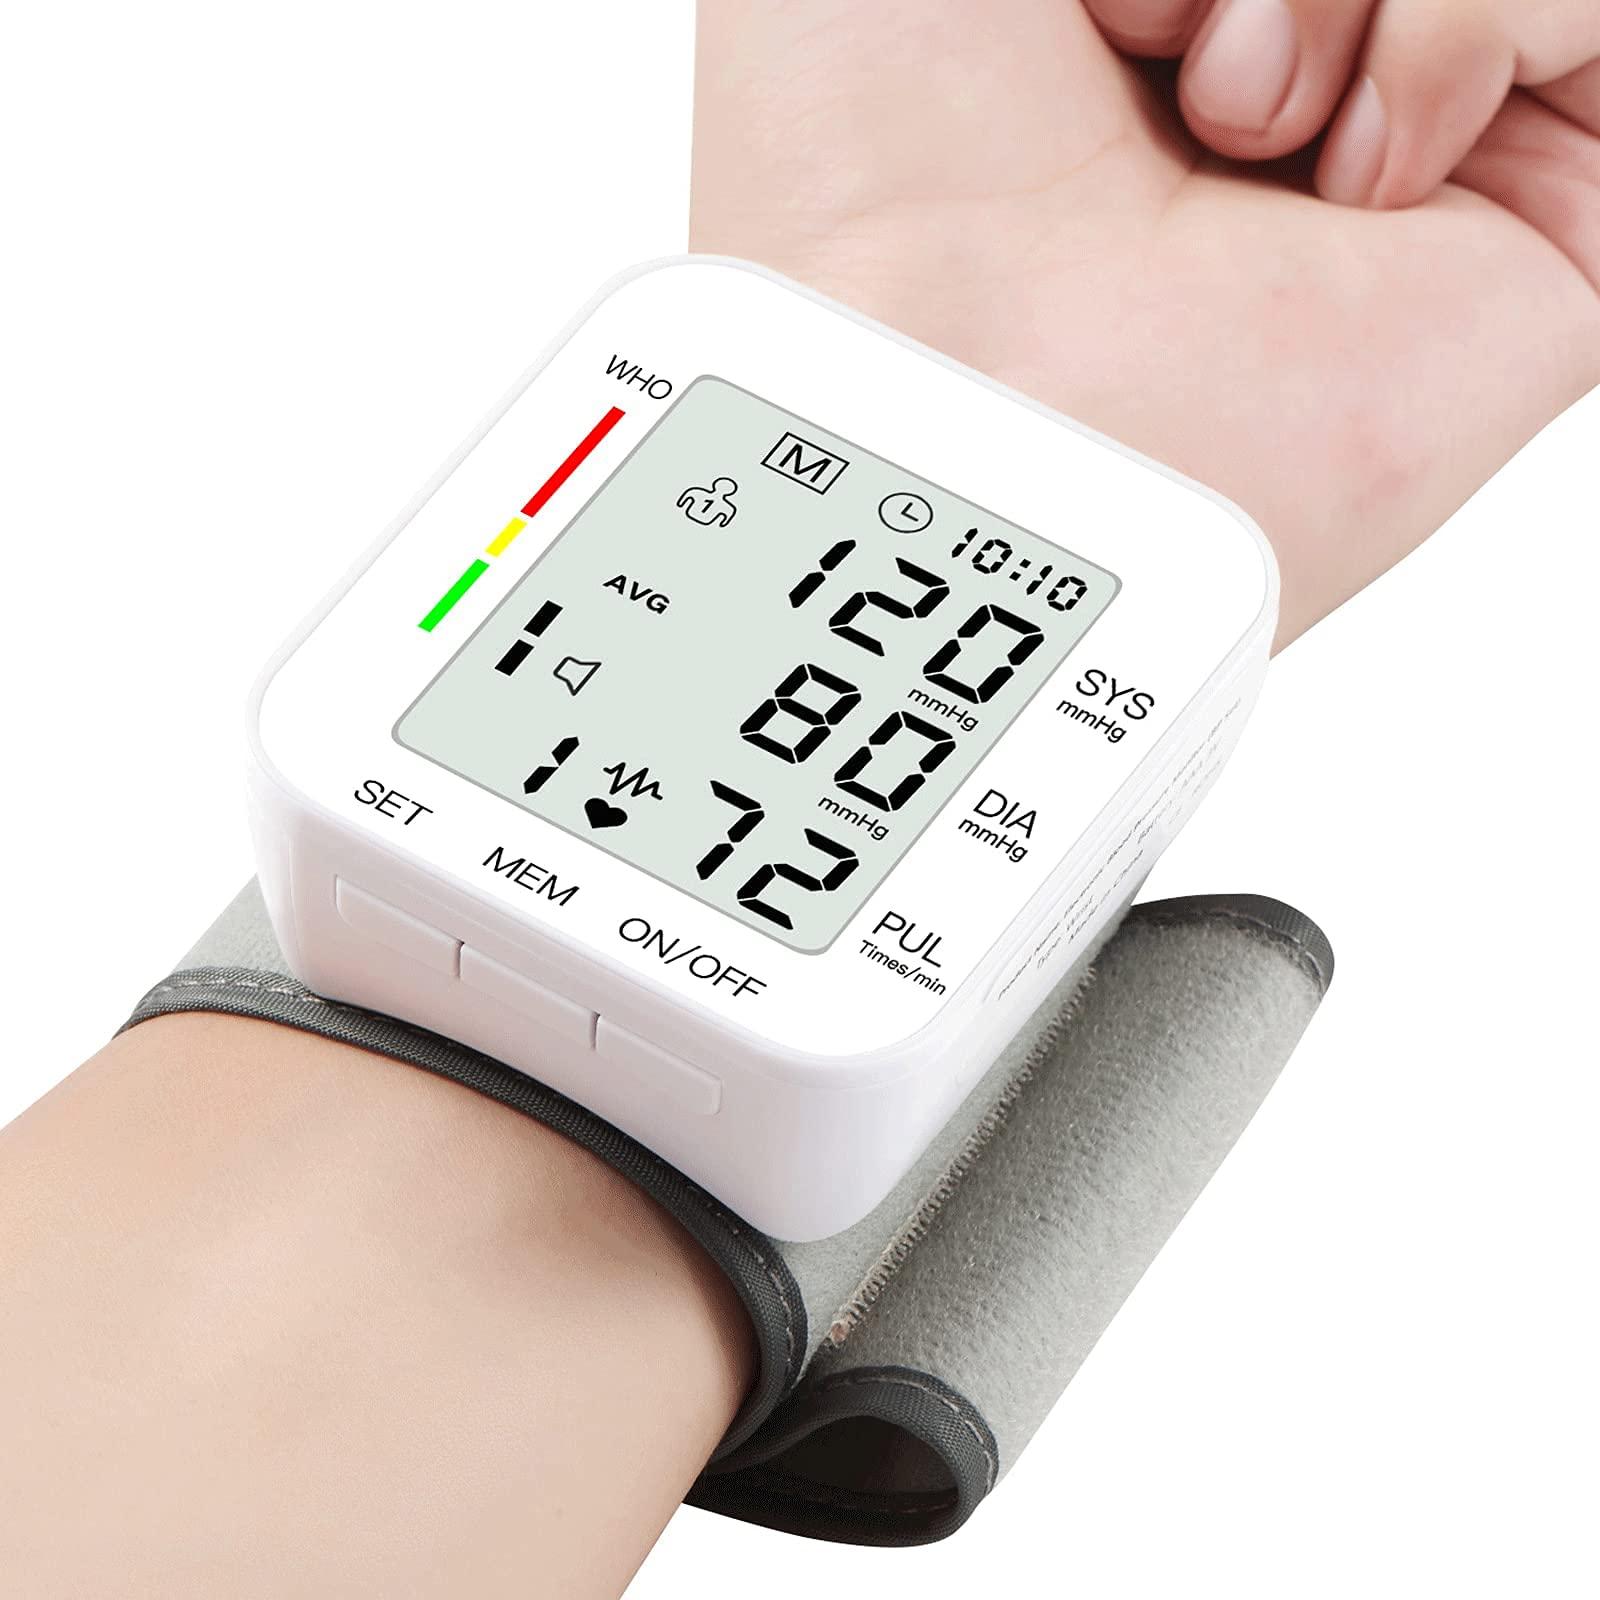 Blood Pressure Monitor LCD Display Adjustable Wrist Cuff Blood Pressure Monitors Ober Health